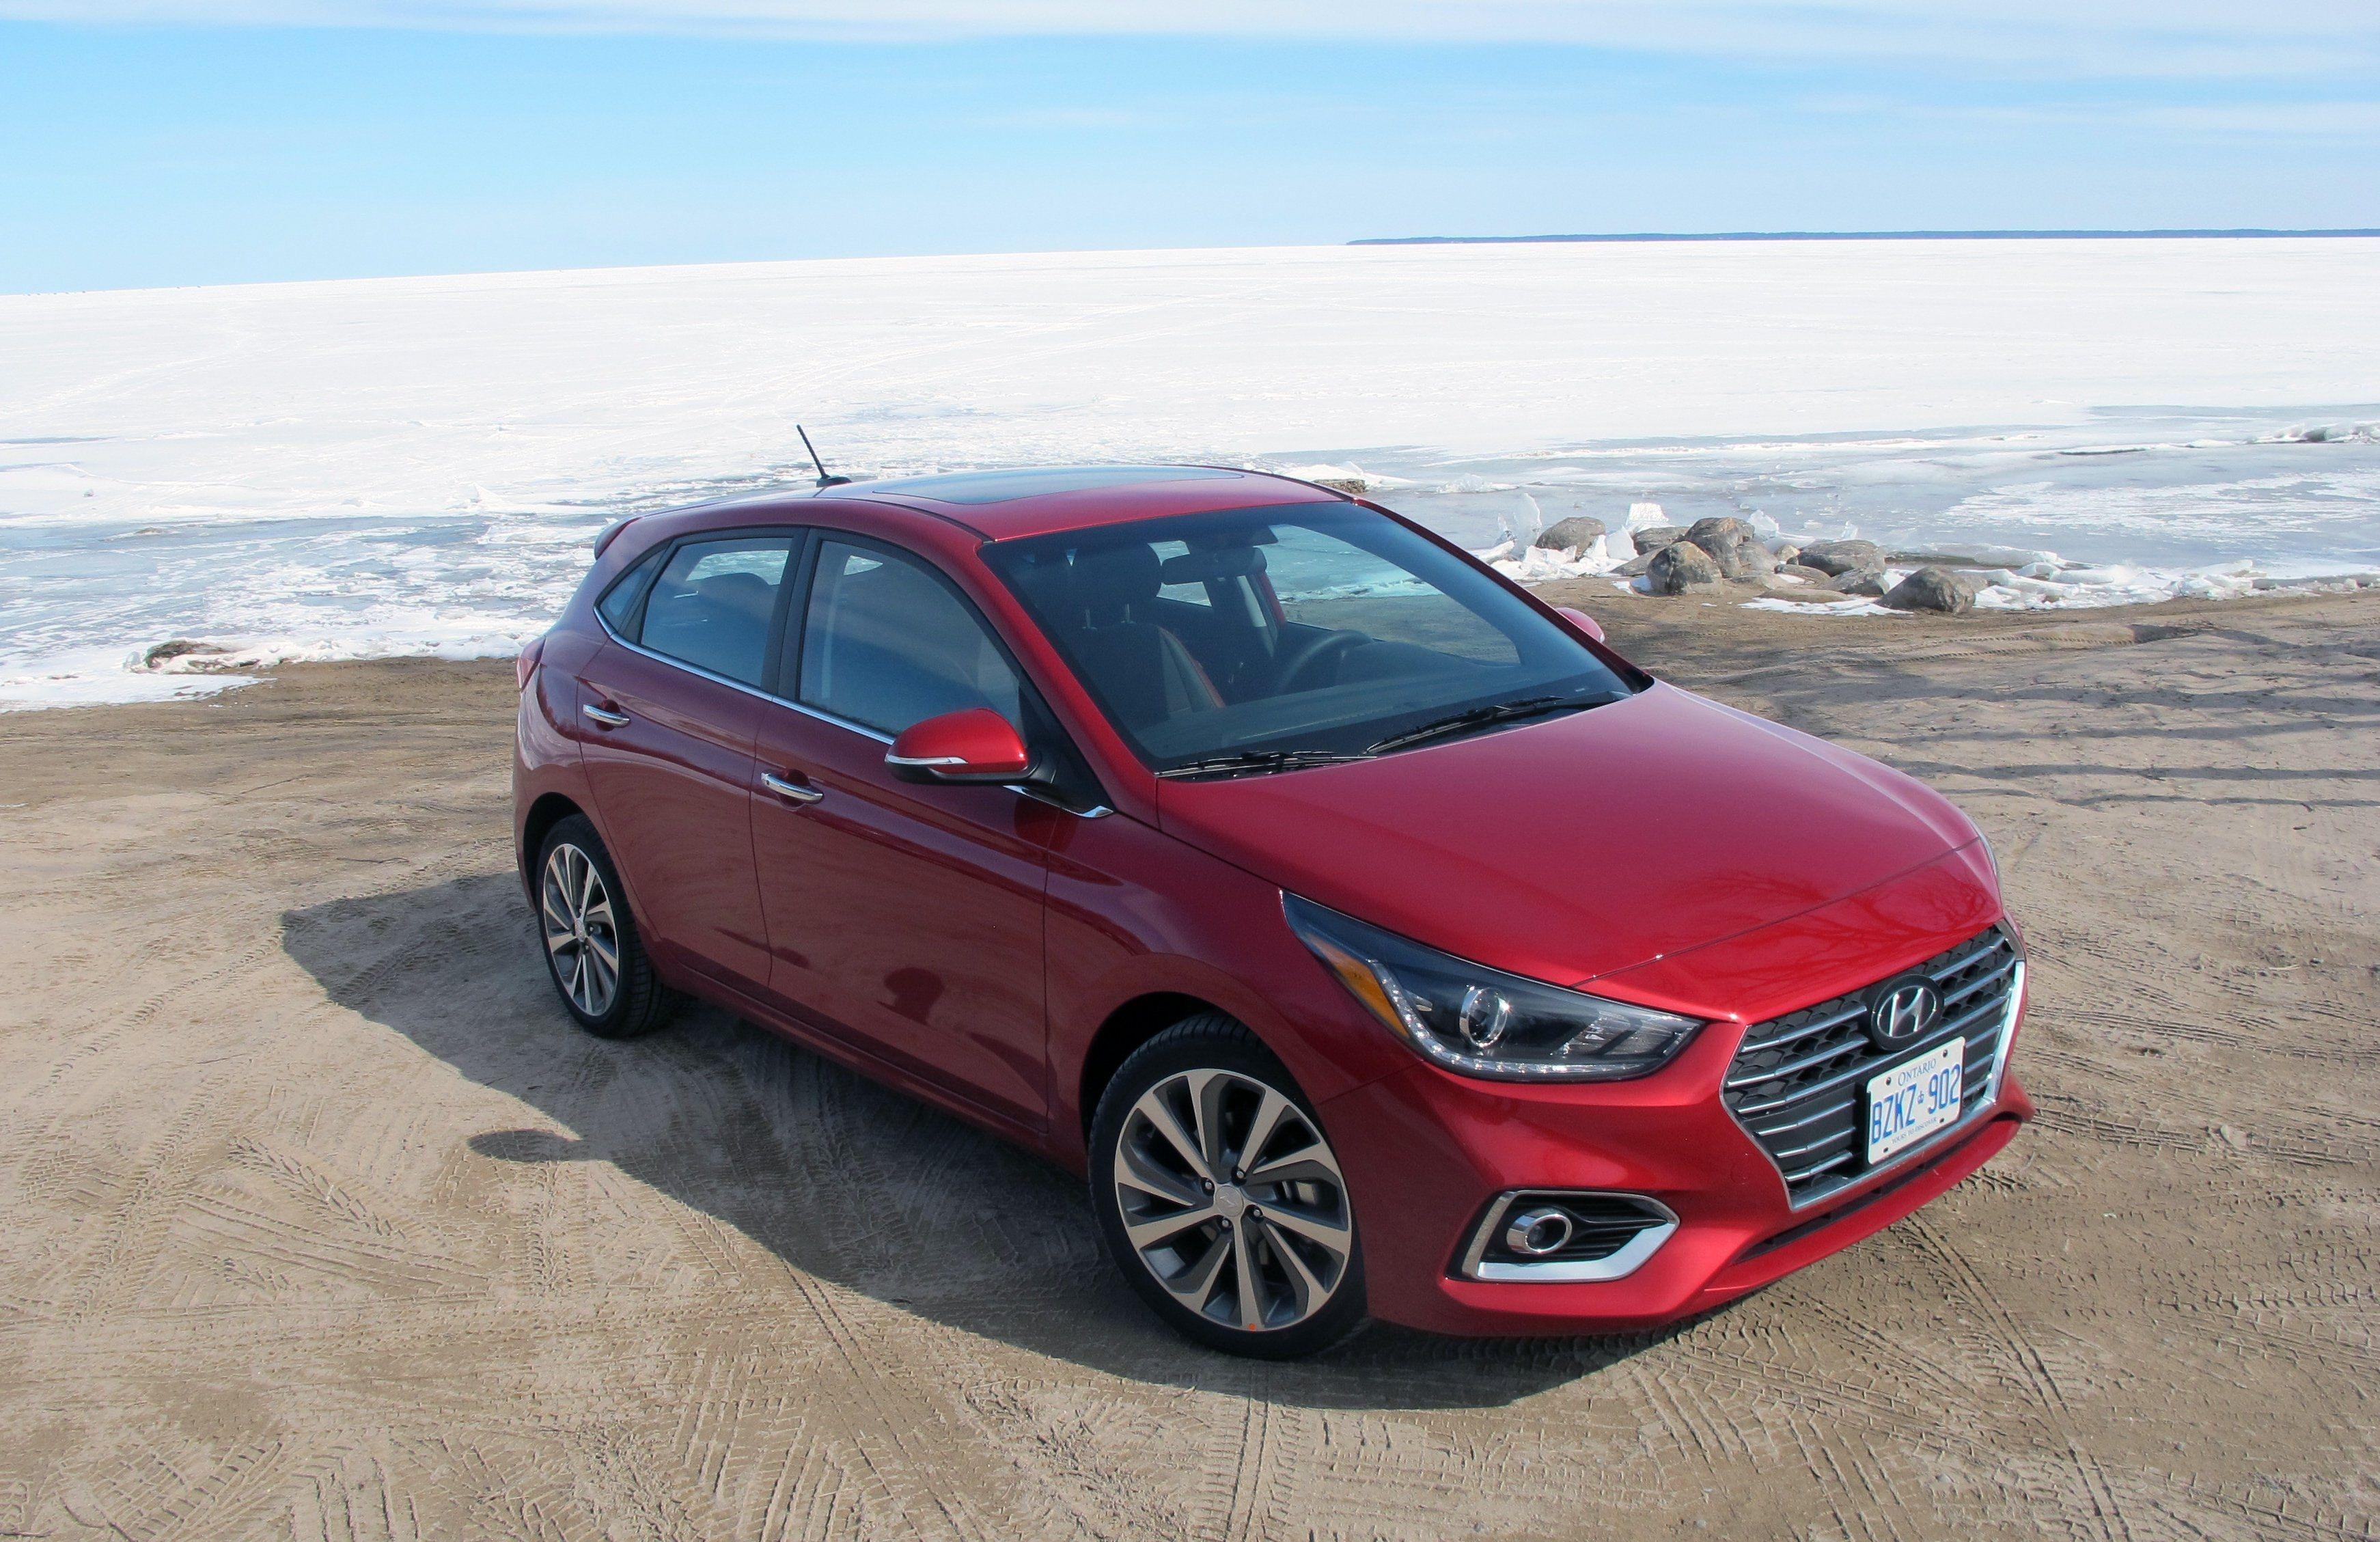 2019 Hyundai Accent Hatchback Photo In 2020 Accent Hatchback Hyundai Accent Hatchback